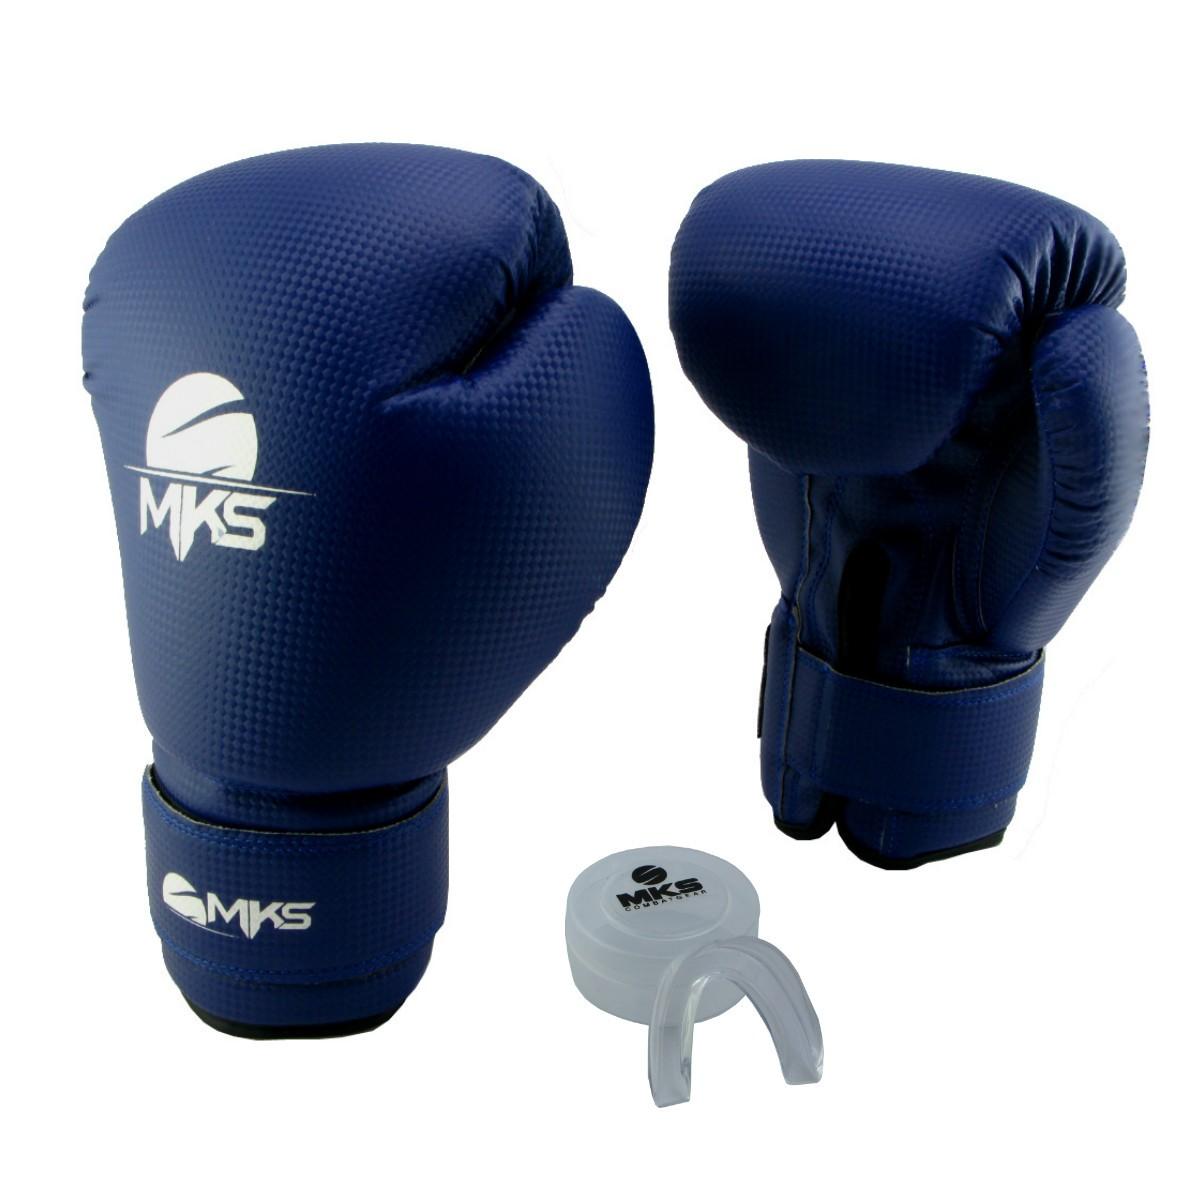 Luva de Boxe Prospect MKS Blue 12 oz + Protetor Bucal